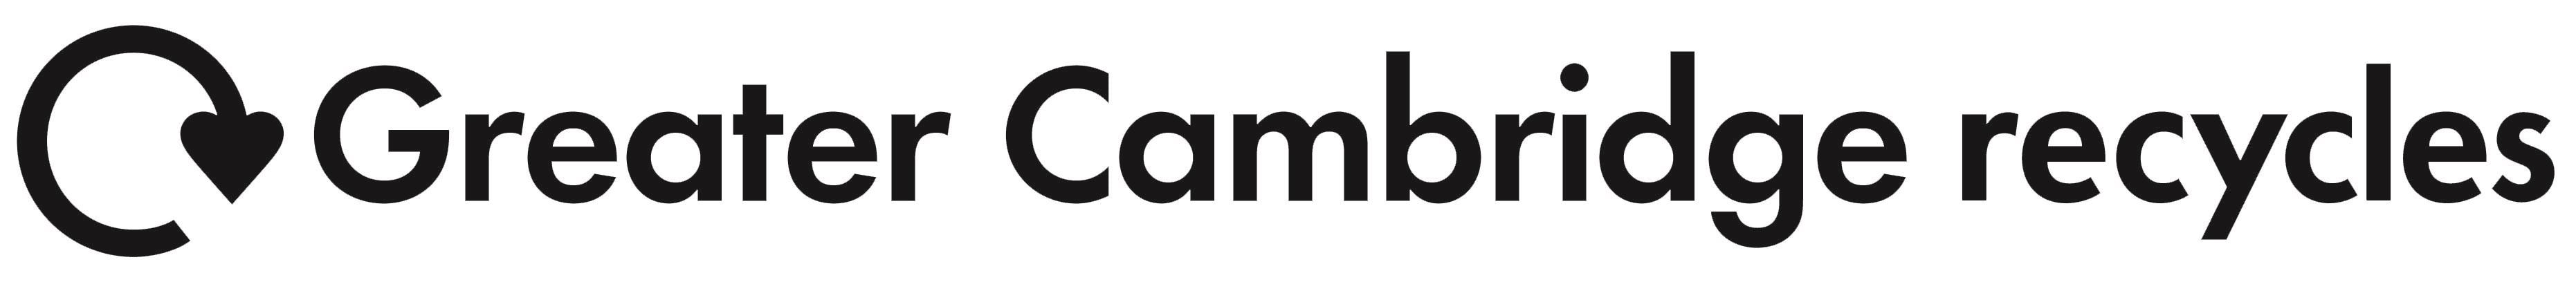 Greater Cambridge recycles logo